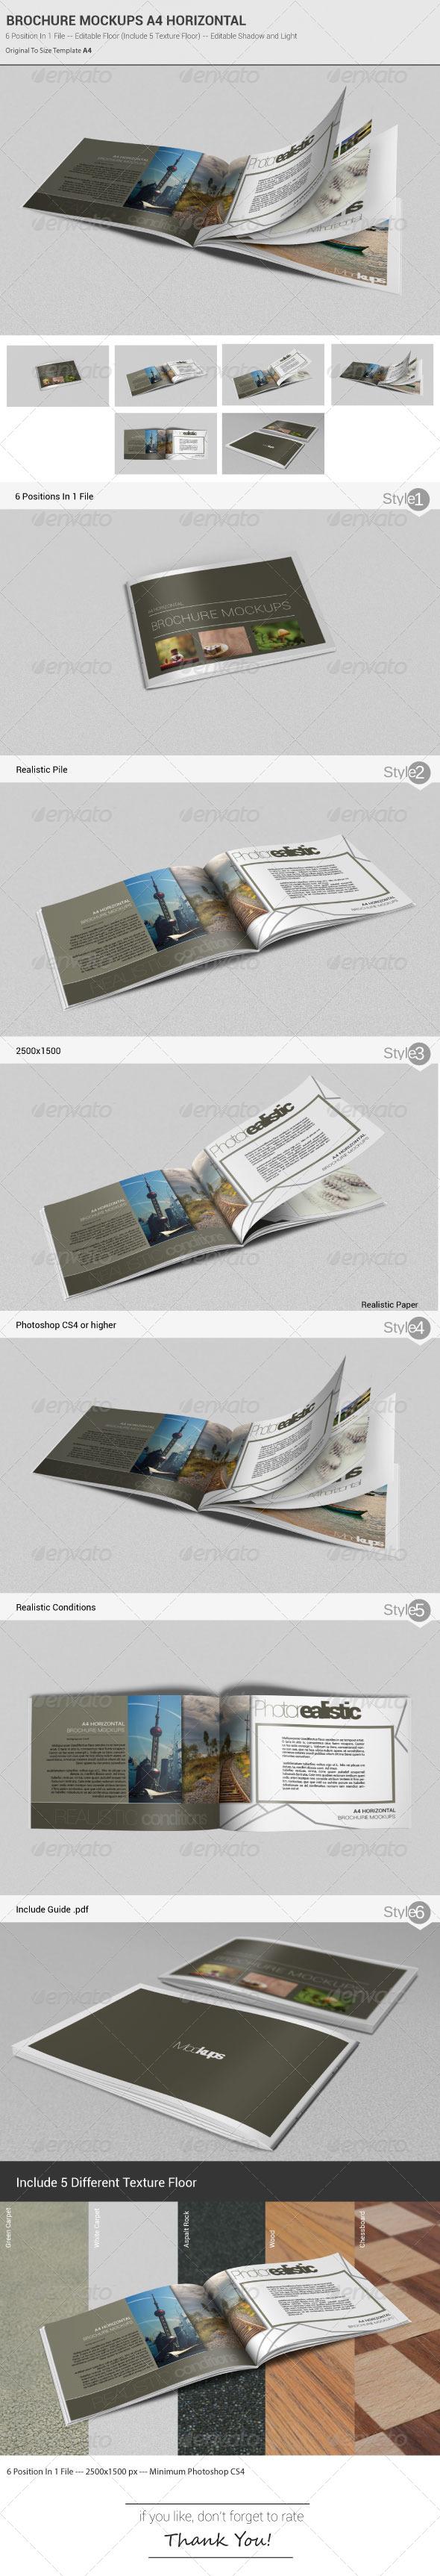 GraphicRiver Brochure Mockups A4 Horizontal 4988223